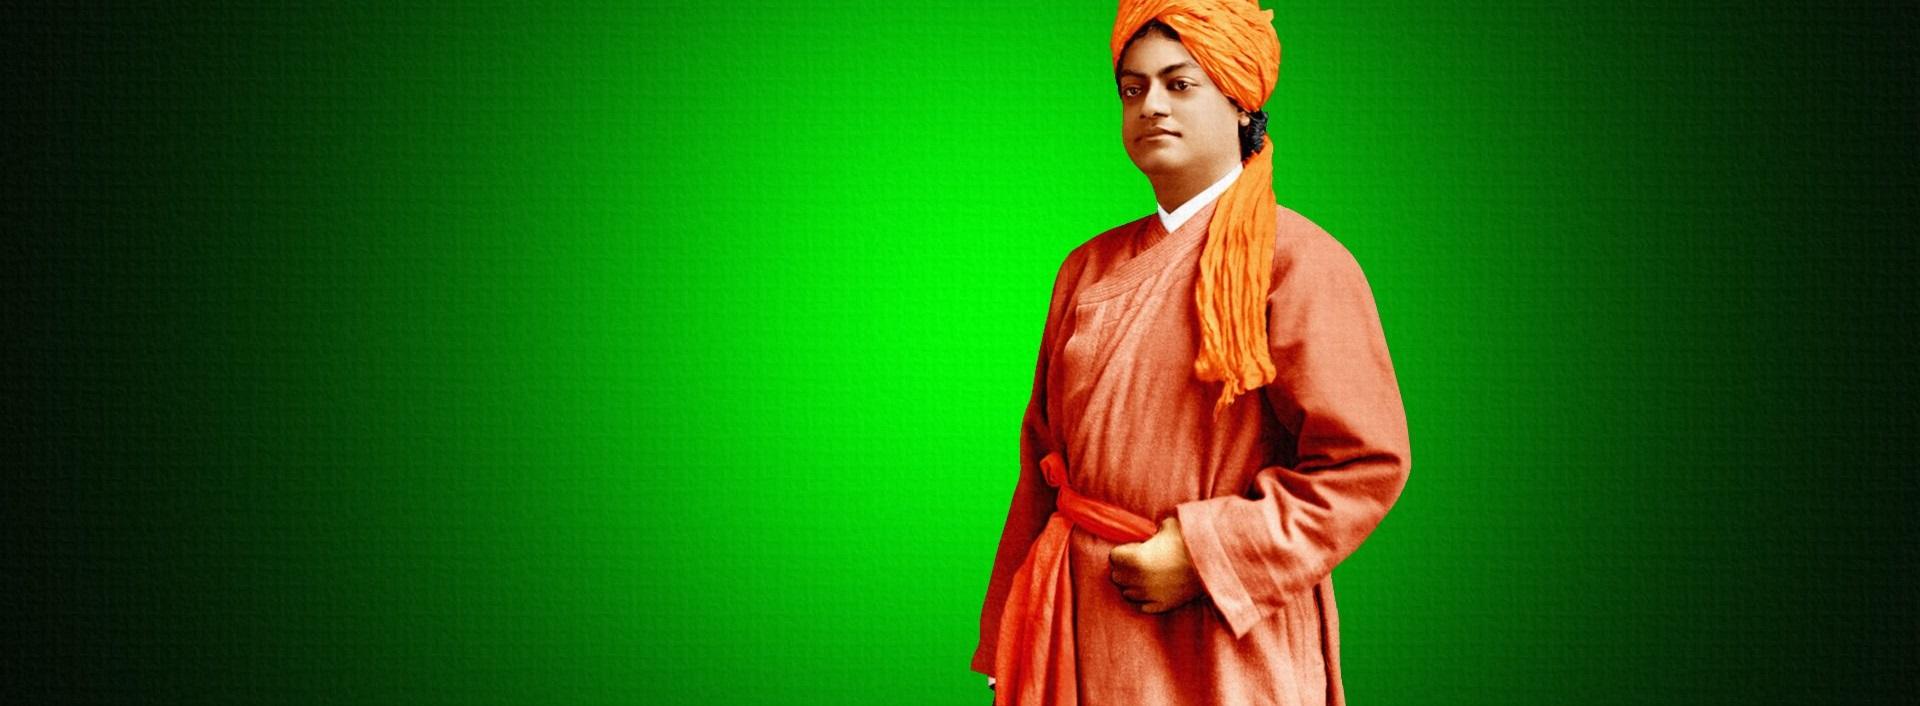 Quotes Vivekananda Swamivivekanandaquotes6  Pantheism